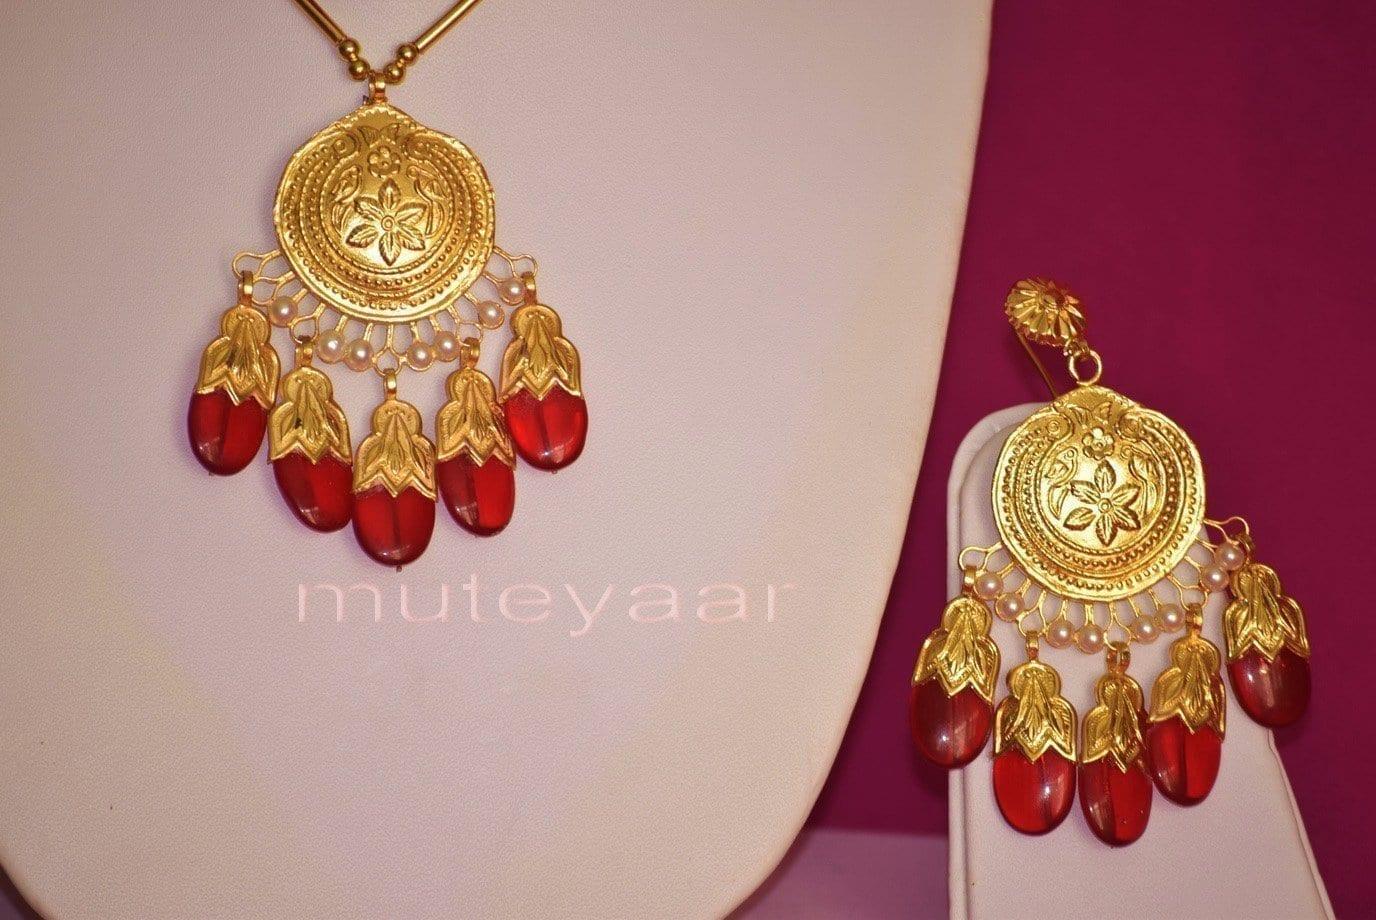 24 Ct. Gold Plated Traditional Punjabi Dakh Set jewellery with Tikka  J0210 2